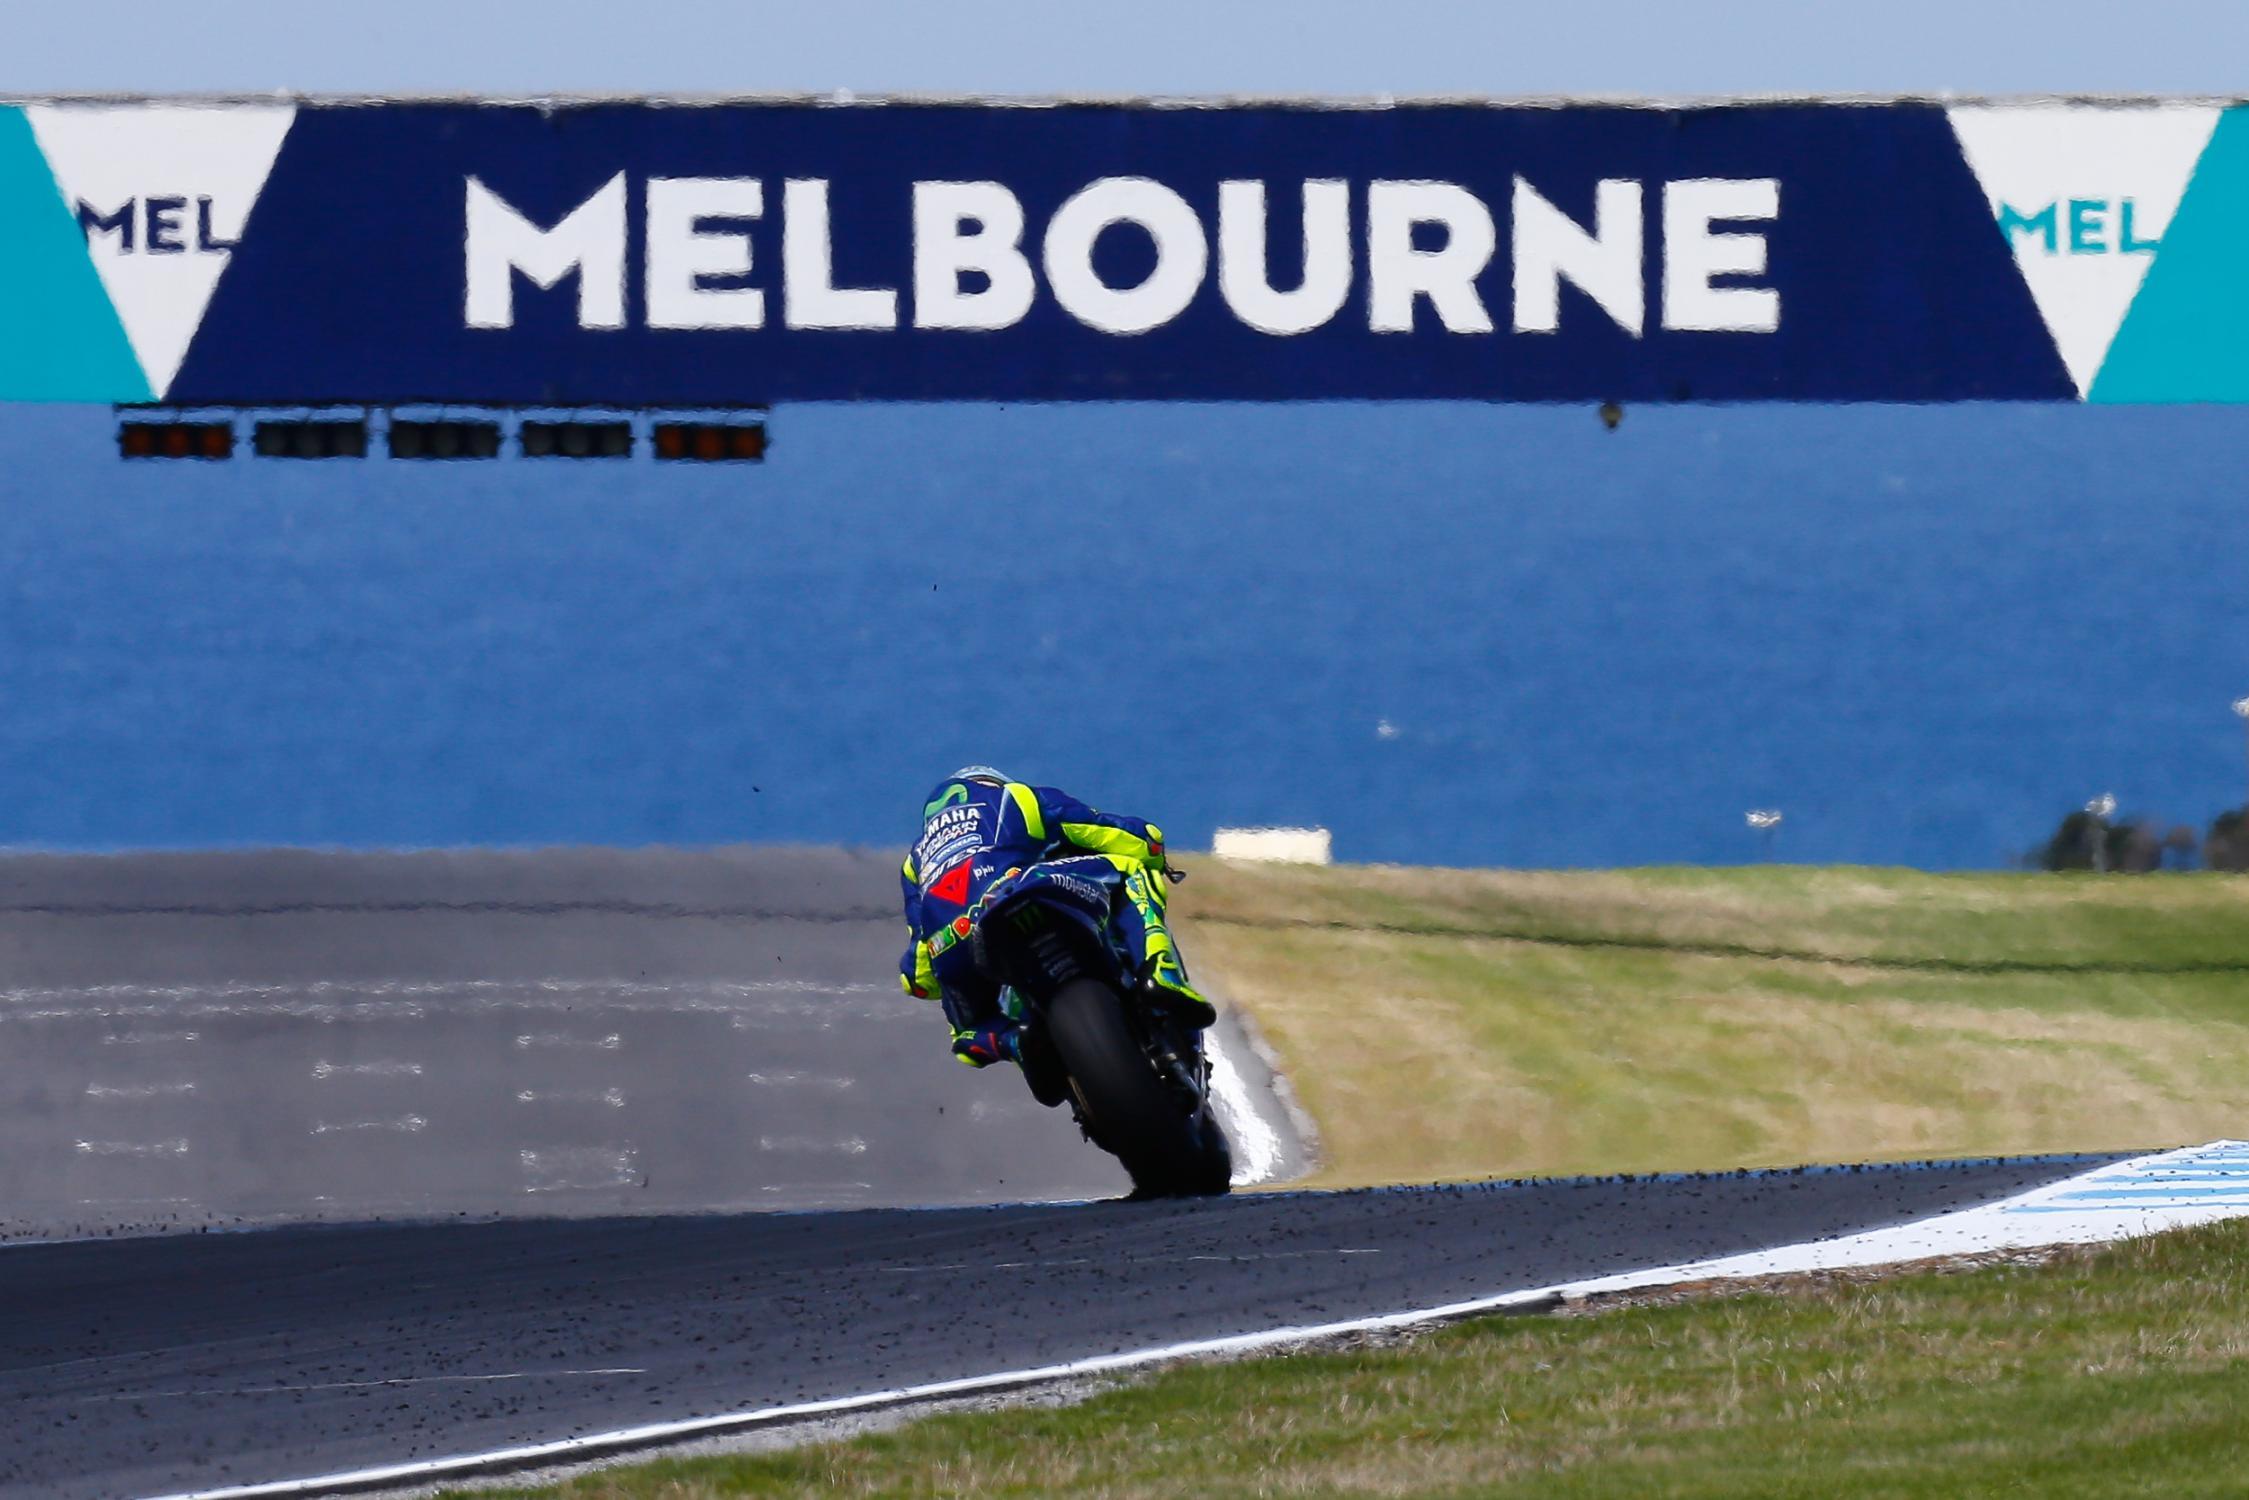 [MotoGP] Test Phillip Island 46-valentino-rossi-ita-2017-action-australia-motogp-phillip-island-pre-season-test16277_test2017_action.gallery_full_top_fullscreen